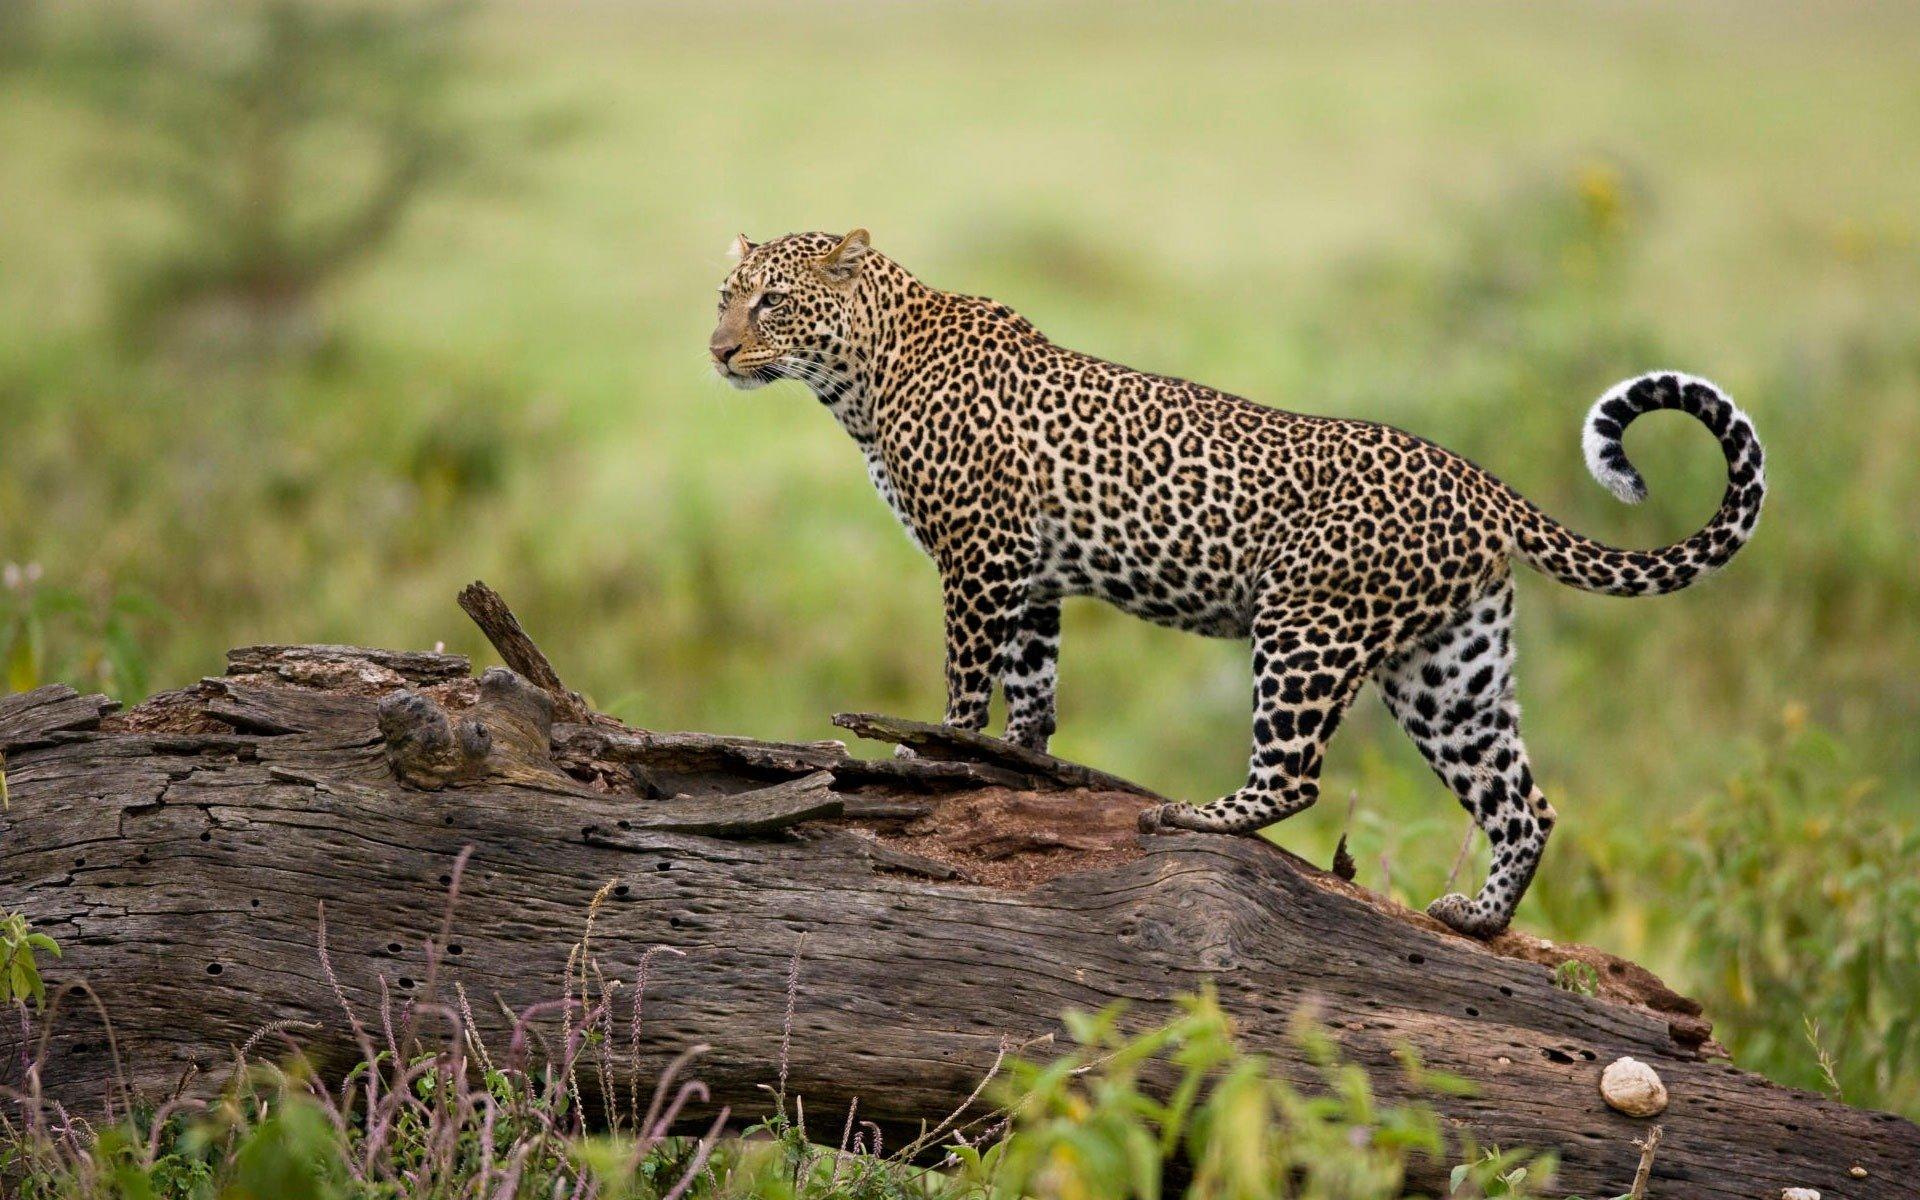 сожалению, фото леопарда в природе аверсе